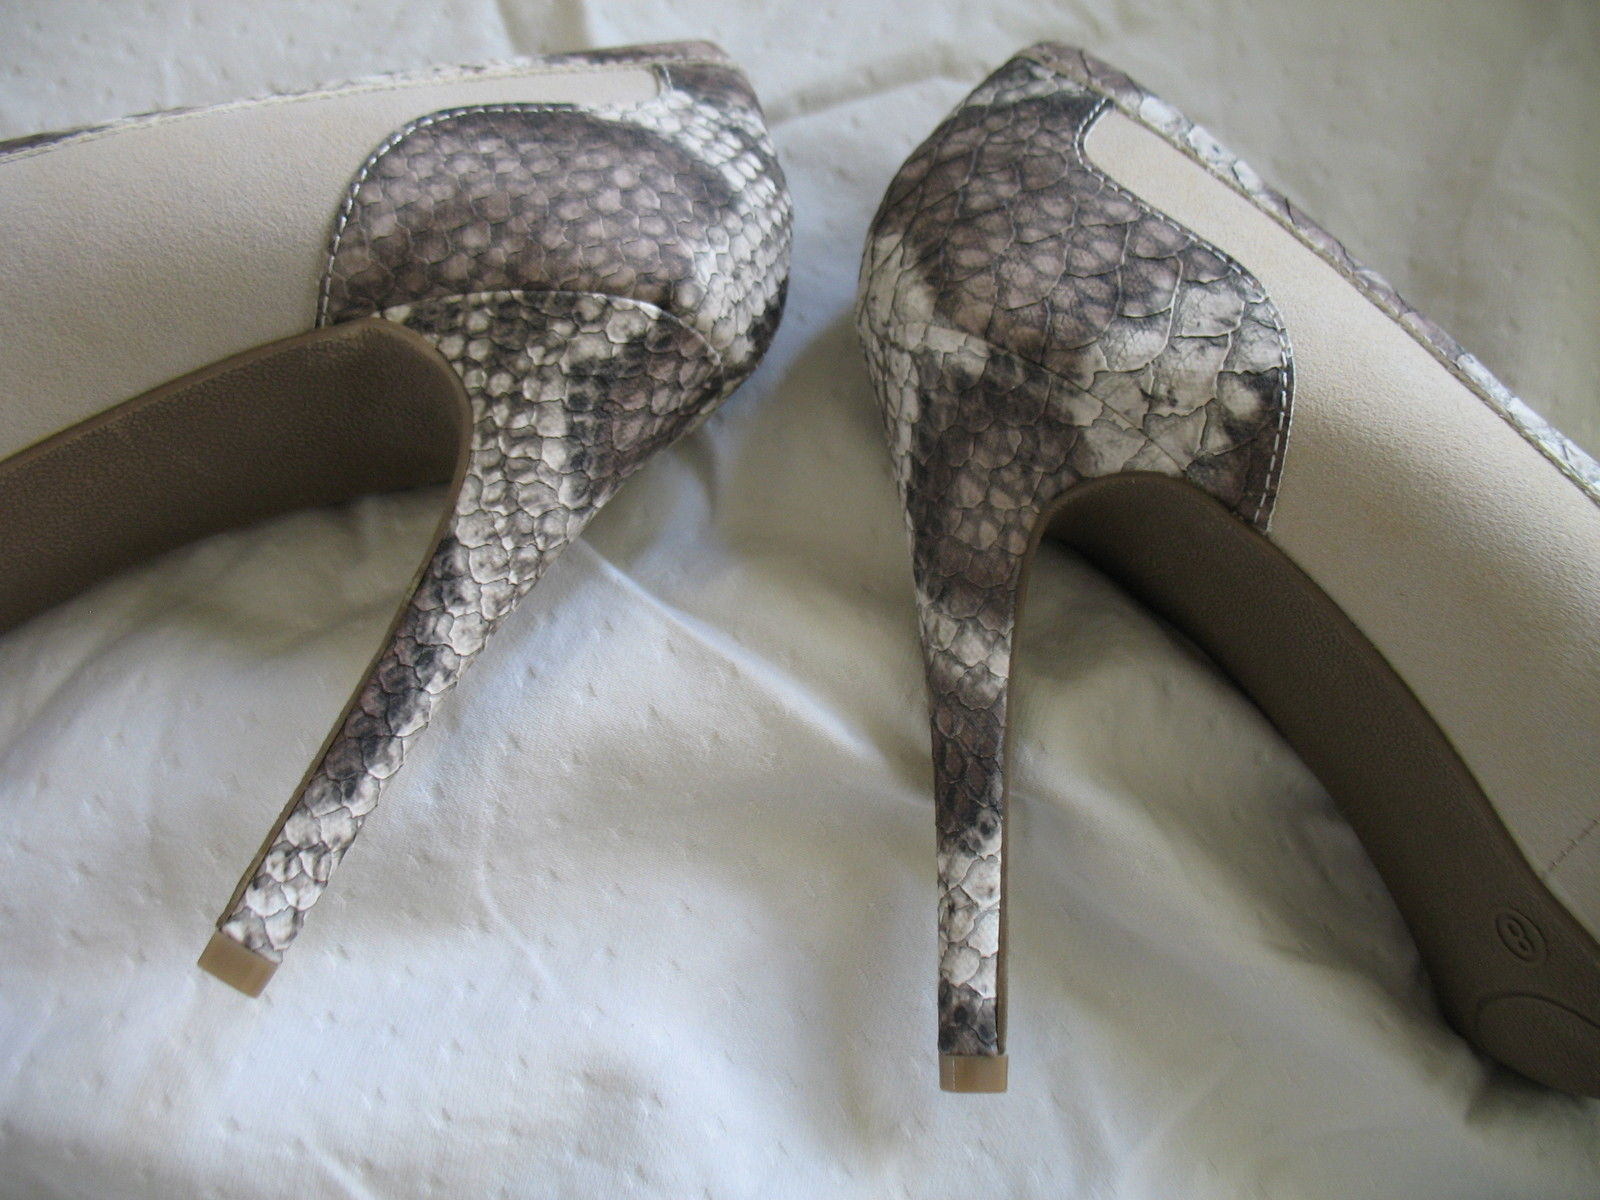 Forever Paula Abdul Size 8 Exotic Print Pump New High Heel Beige Avon Club Style image 6